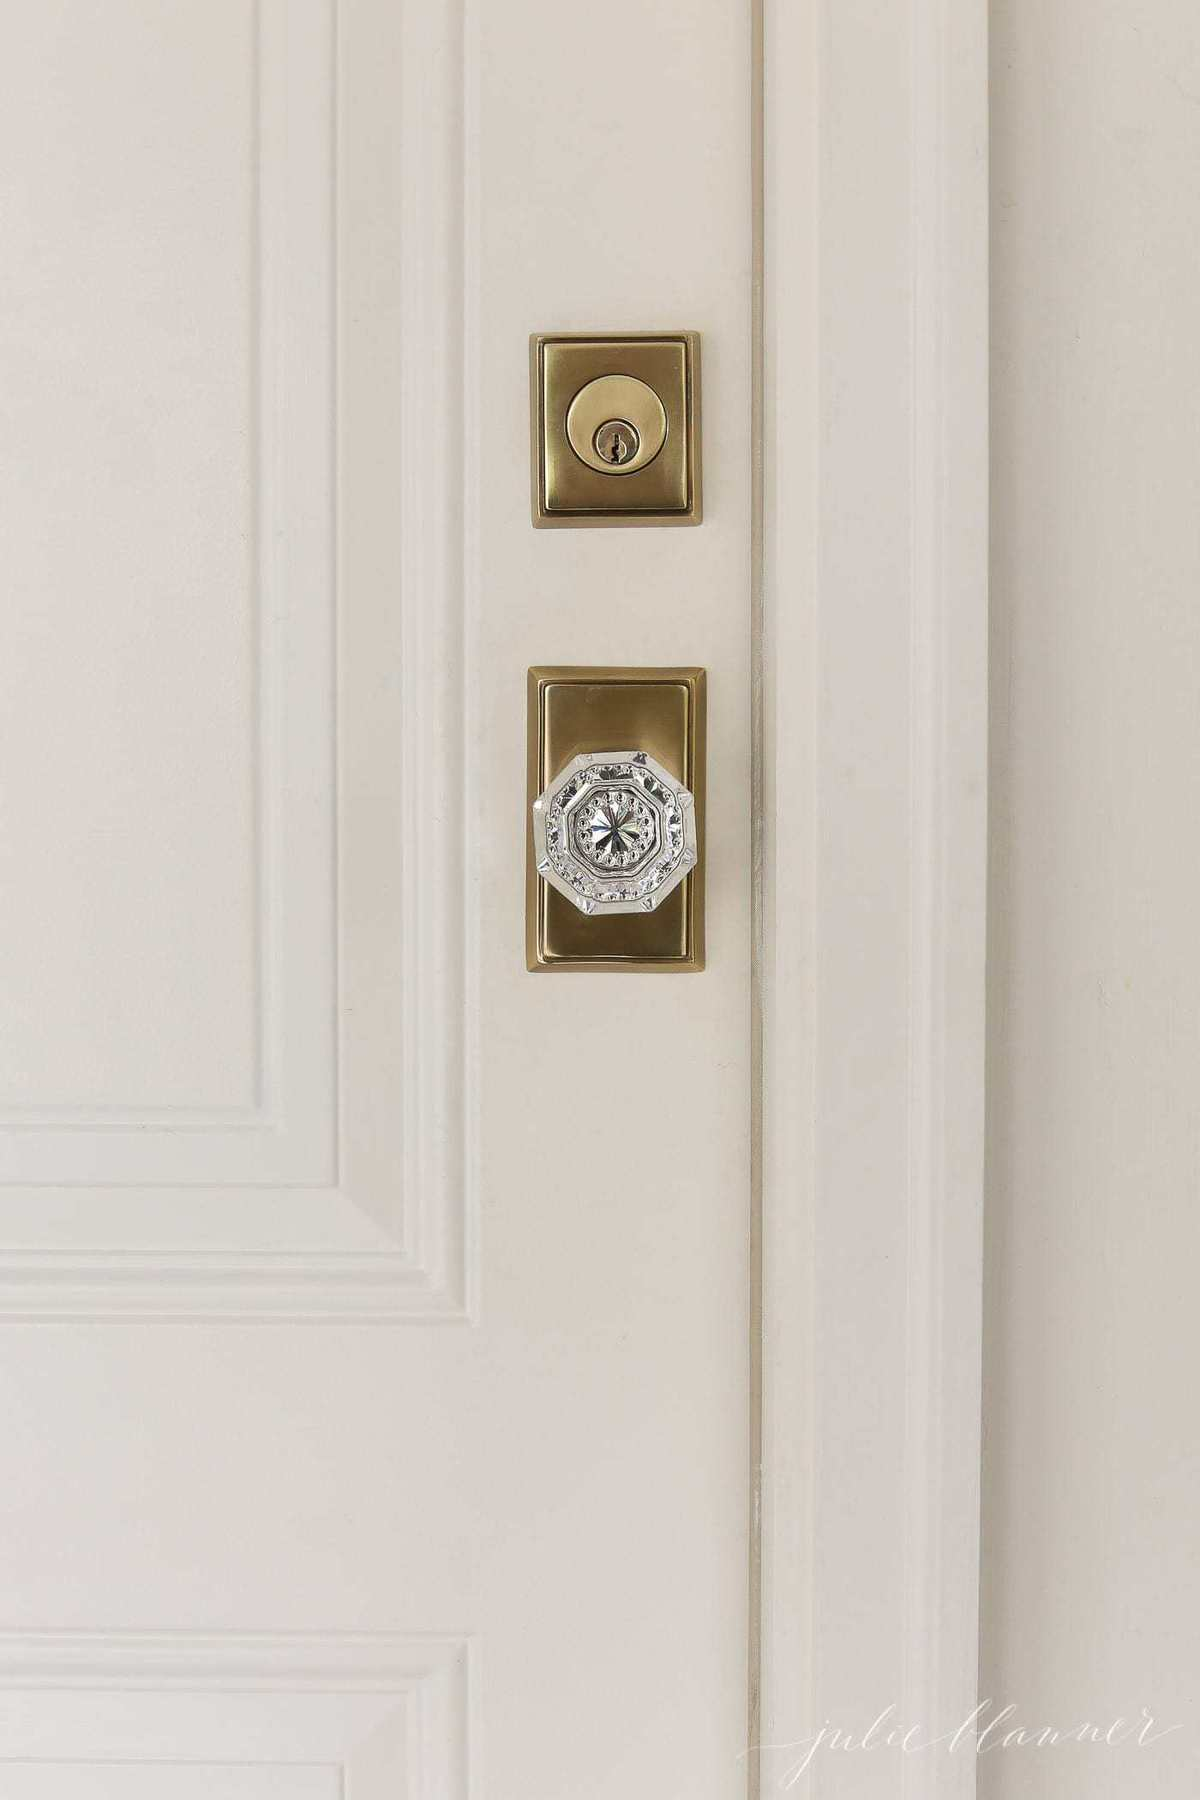 Updating-older-homes & Restyling Your Older Home Without Remodeling ...